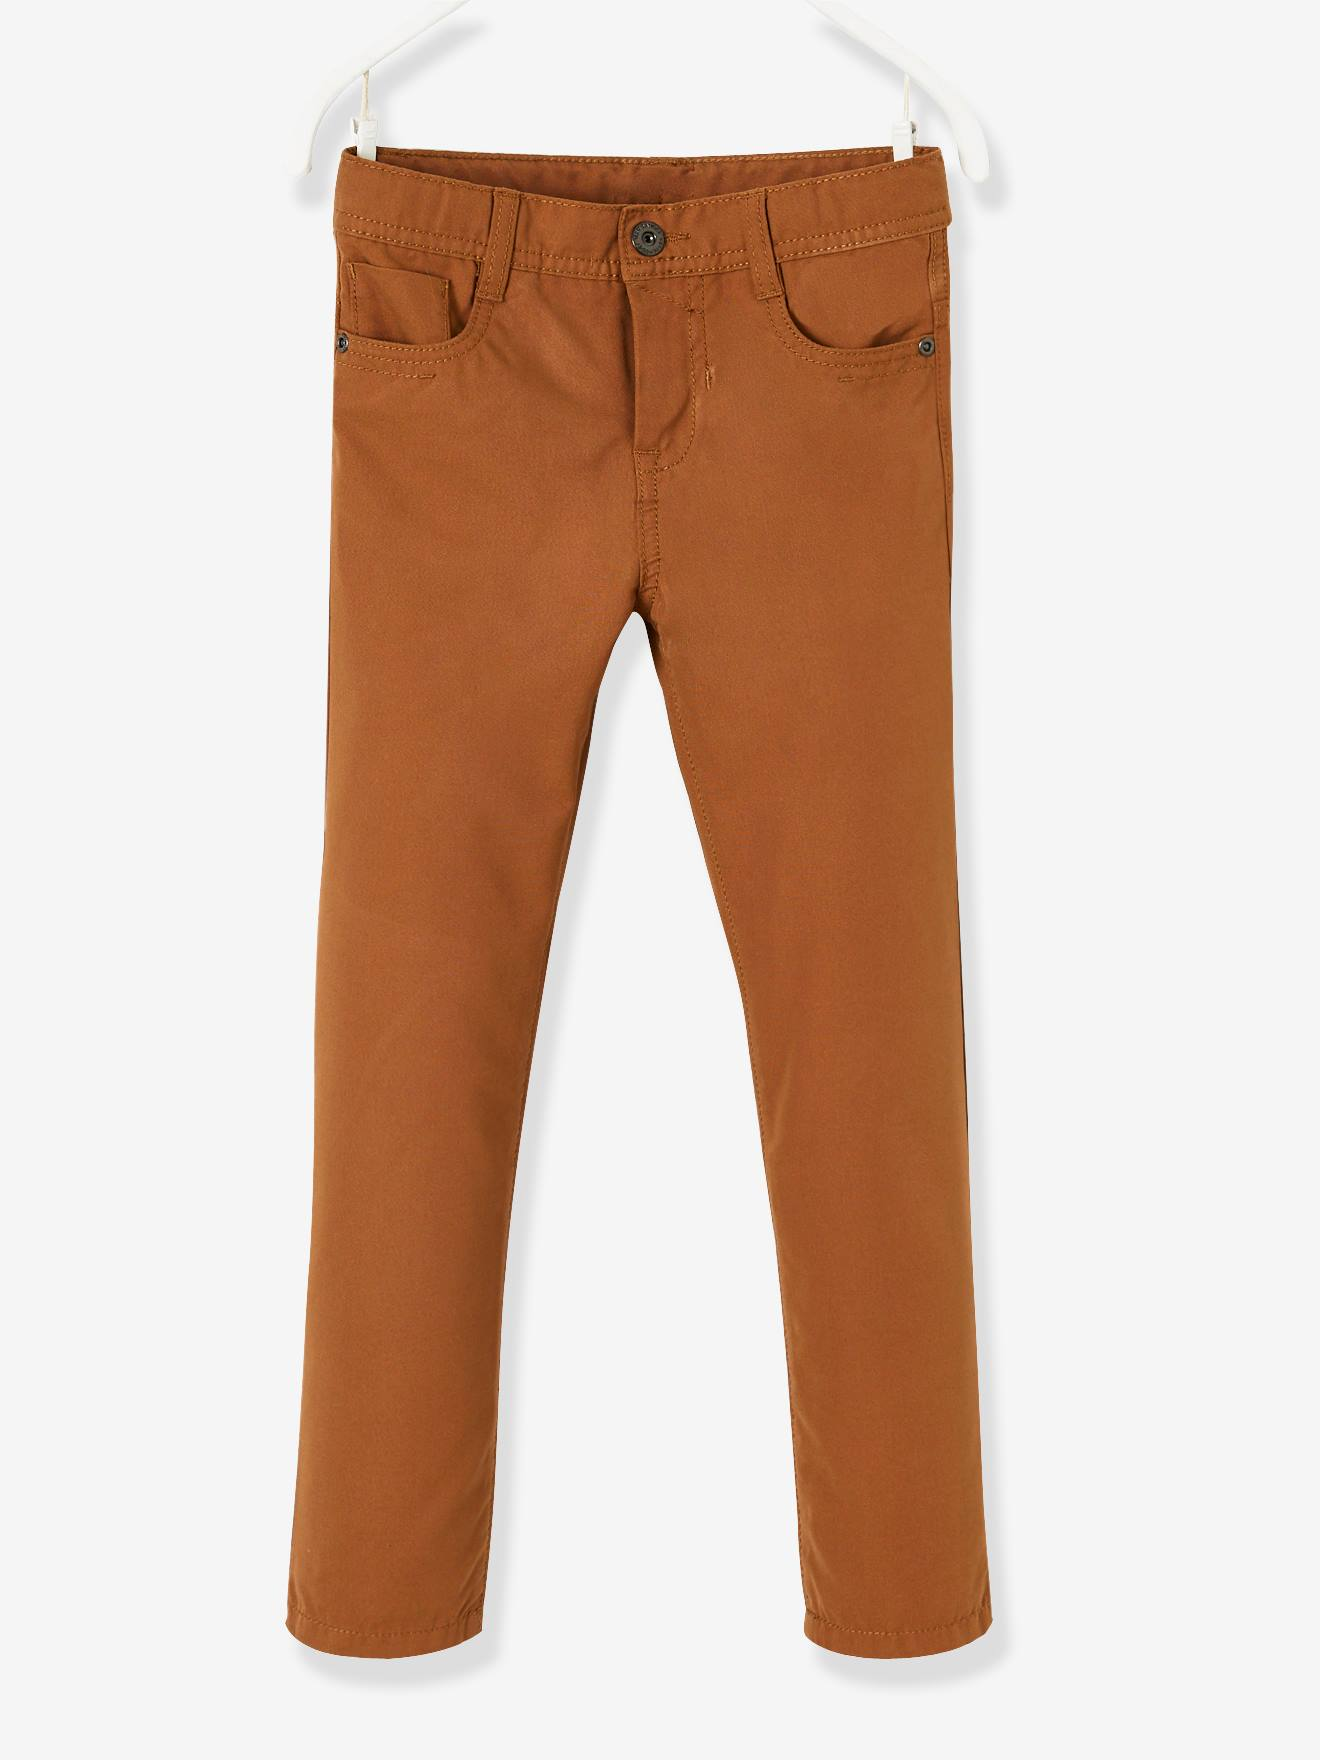 Pantalon garçon enfant Marron - Pantalons